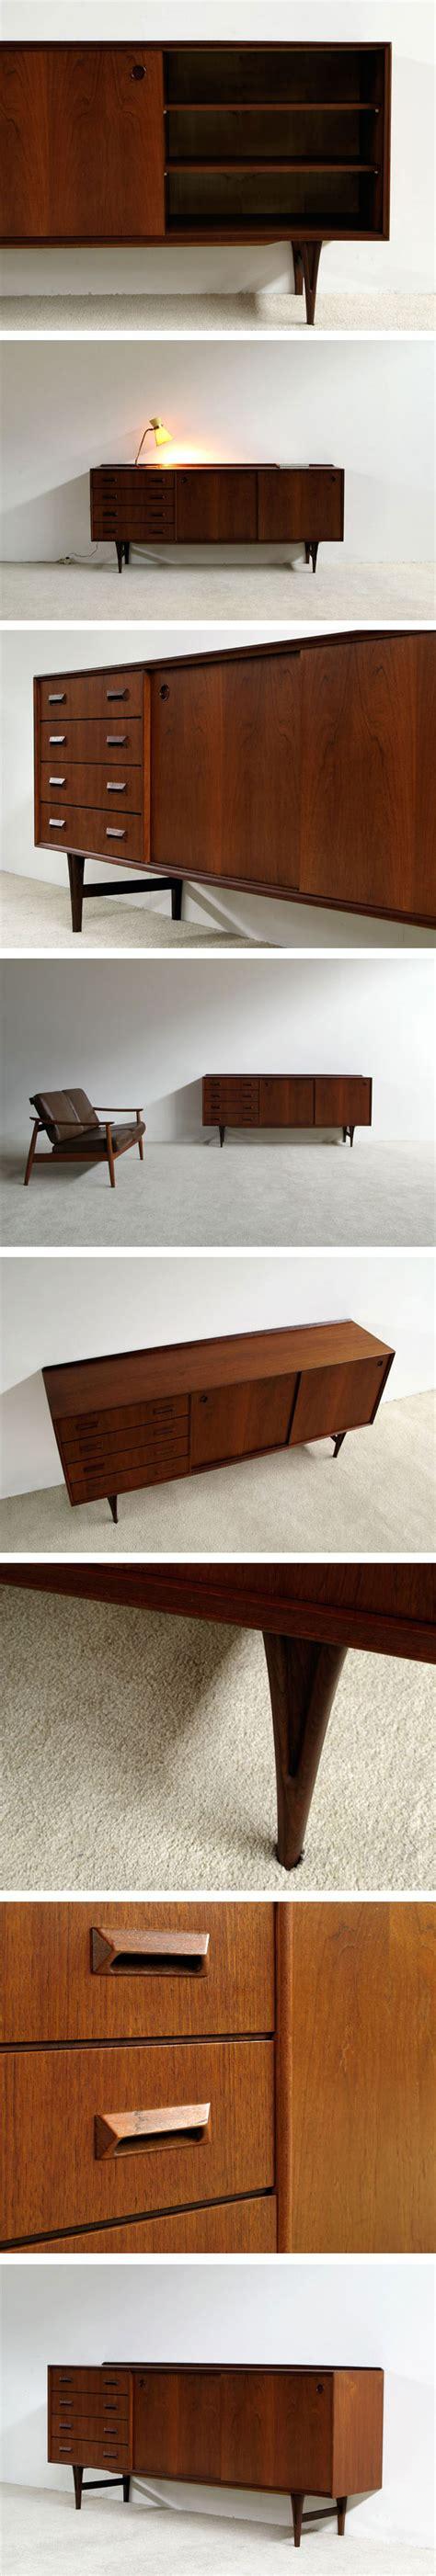 1960 modern furniture modern 1960 grained teak sideboard